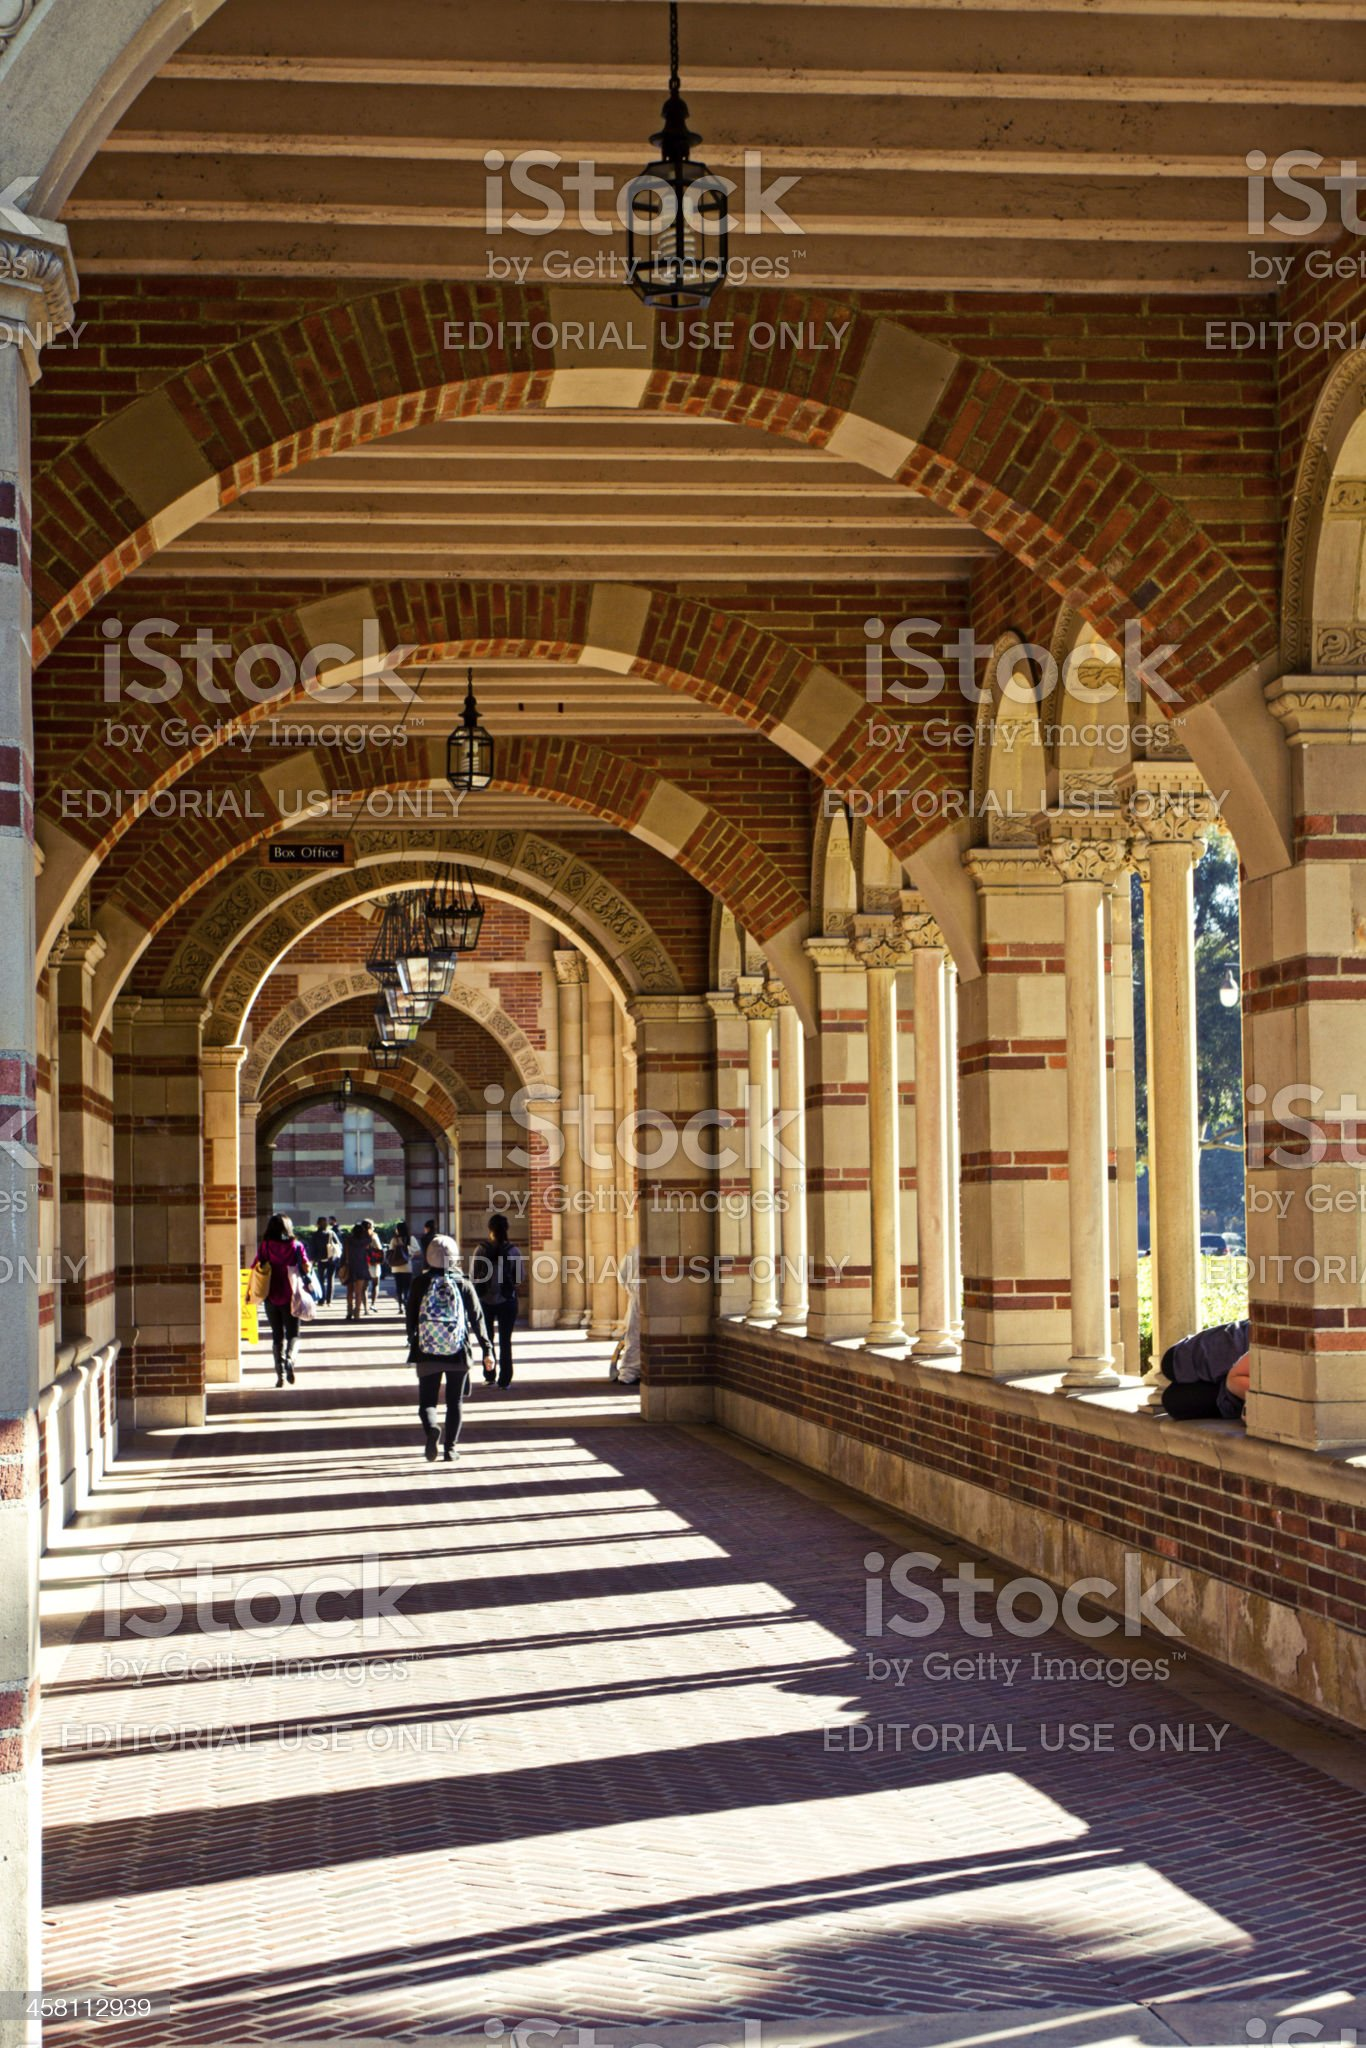 Architectural Detail Indicating University Environment royalty-free stock photo